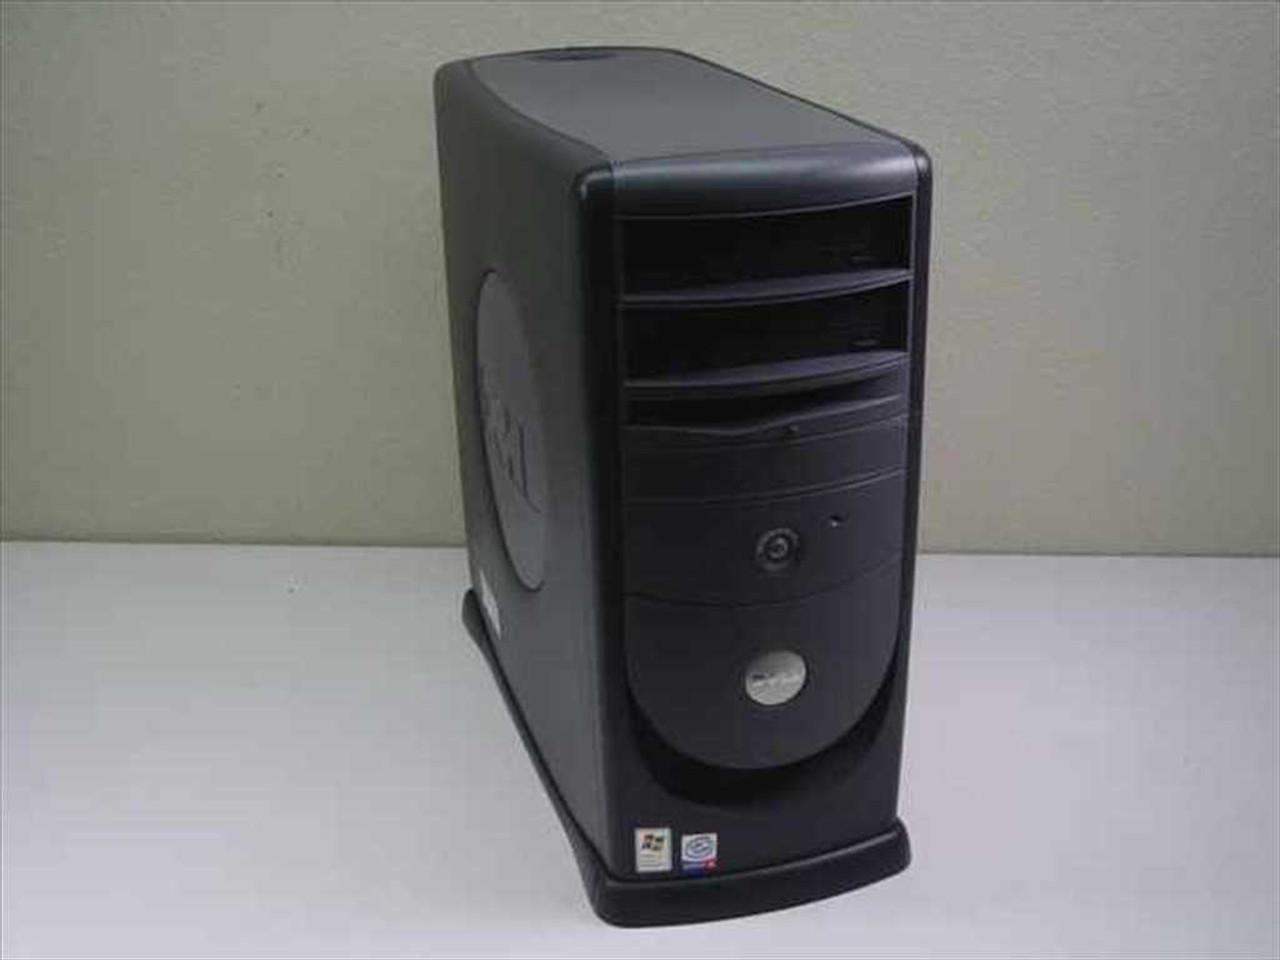 Dell Dimension 8200 Pentium 4 2.0 GHz Tower Computer ...